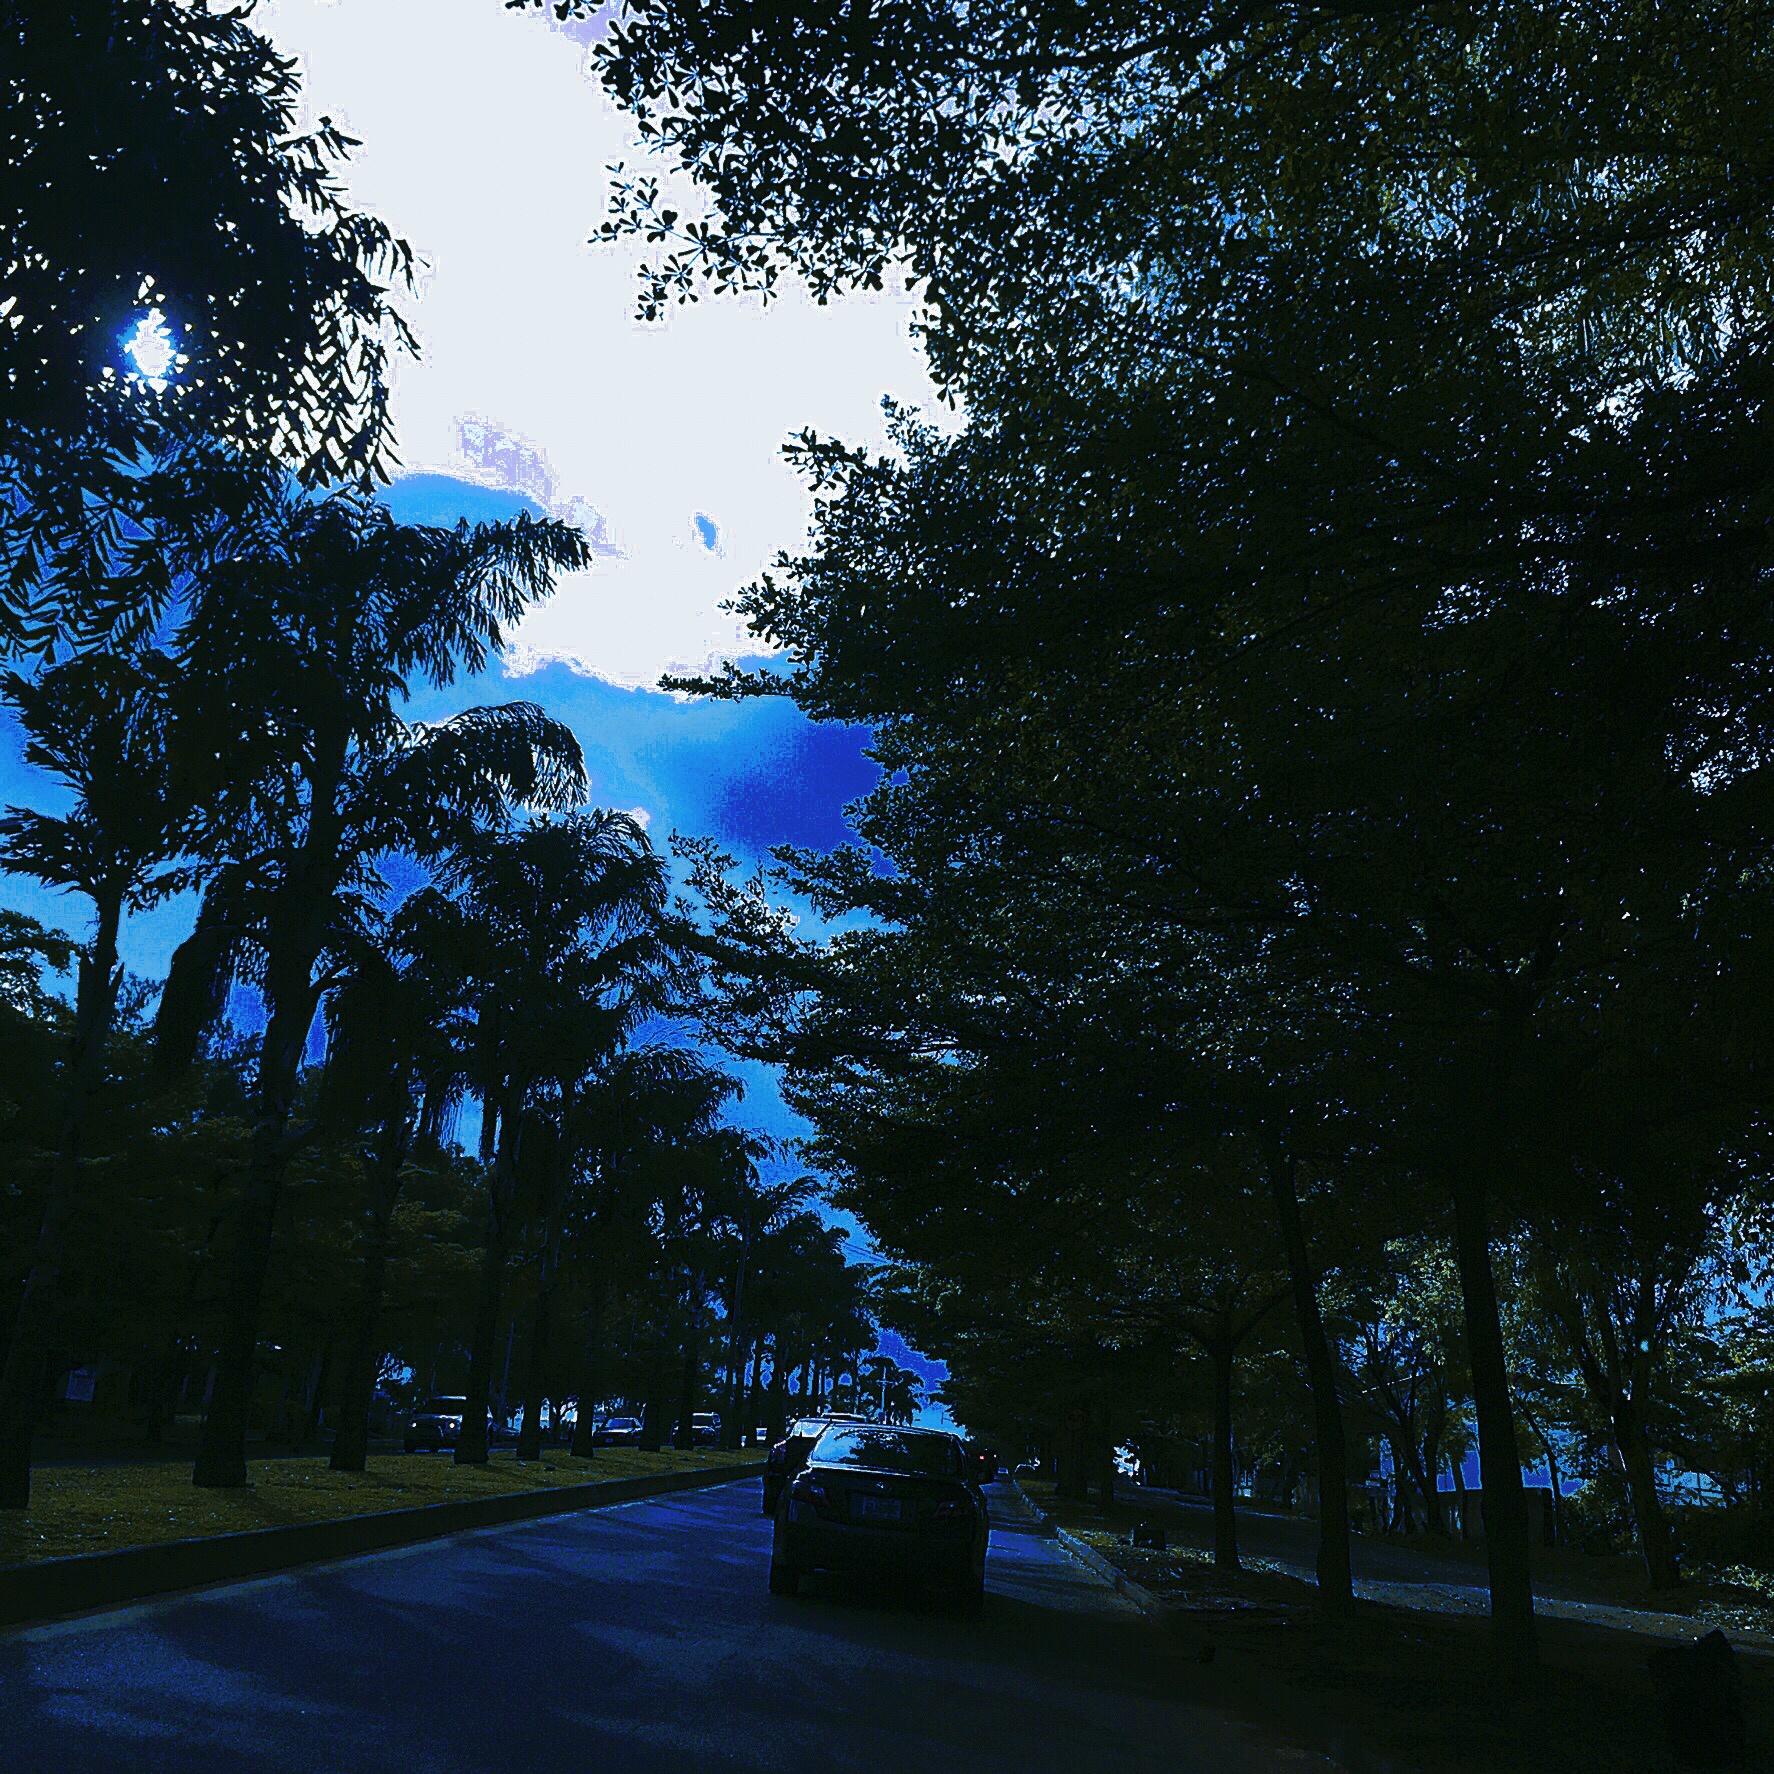 Blue Canopy by ggsani